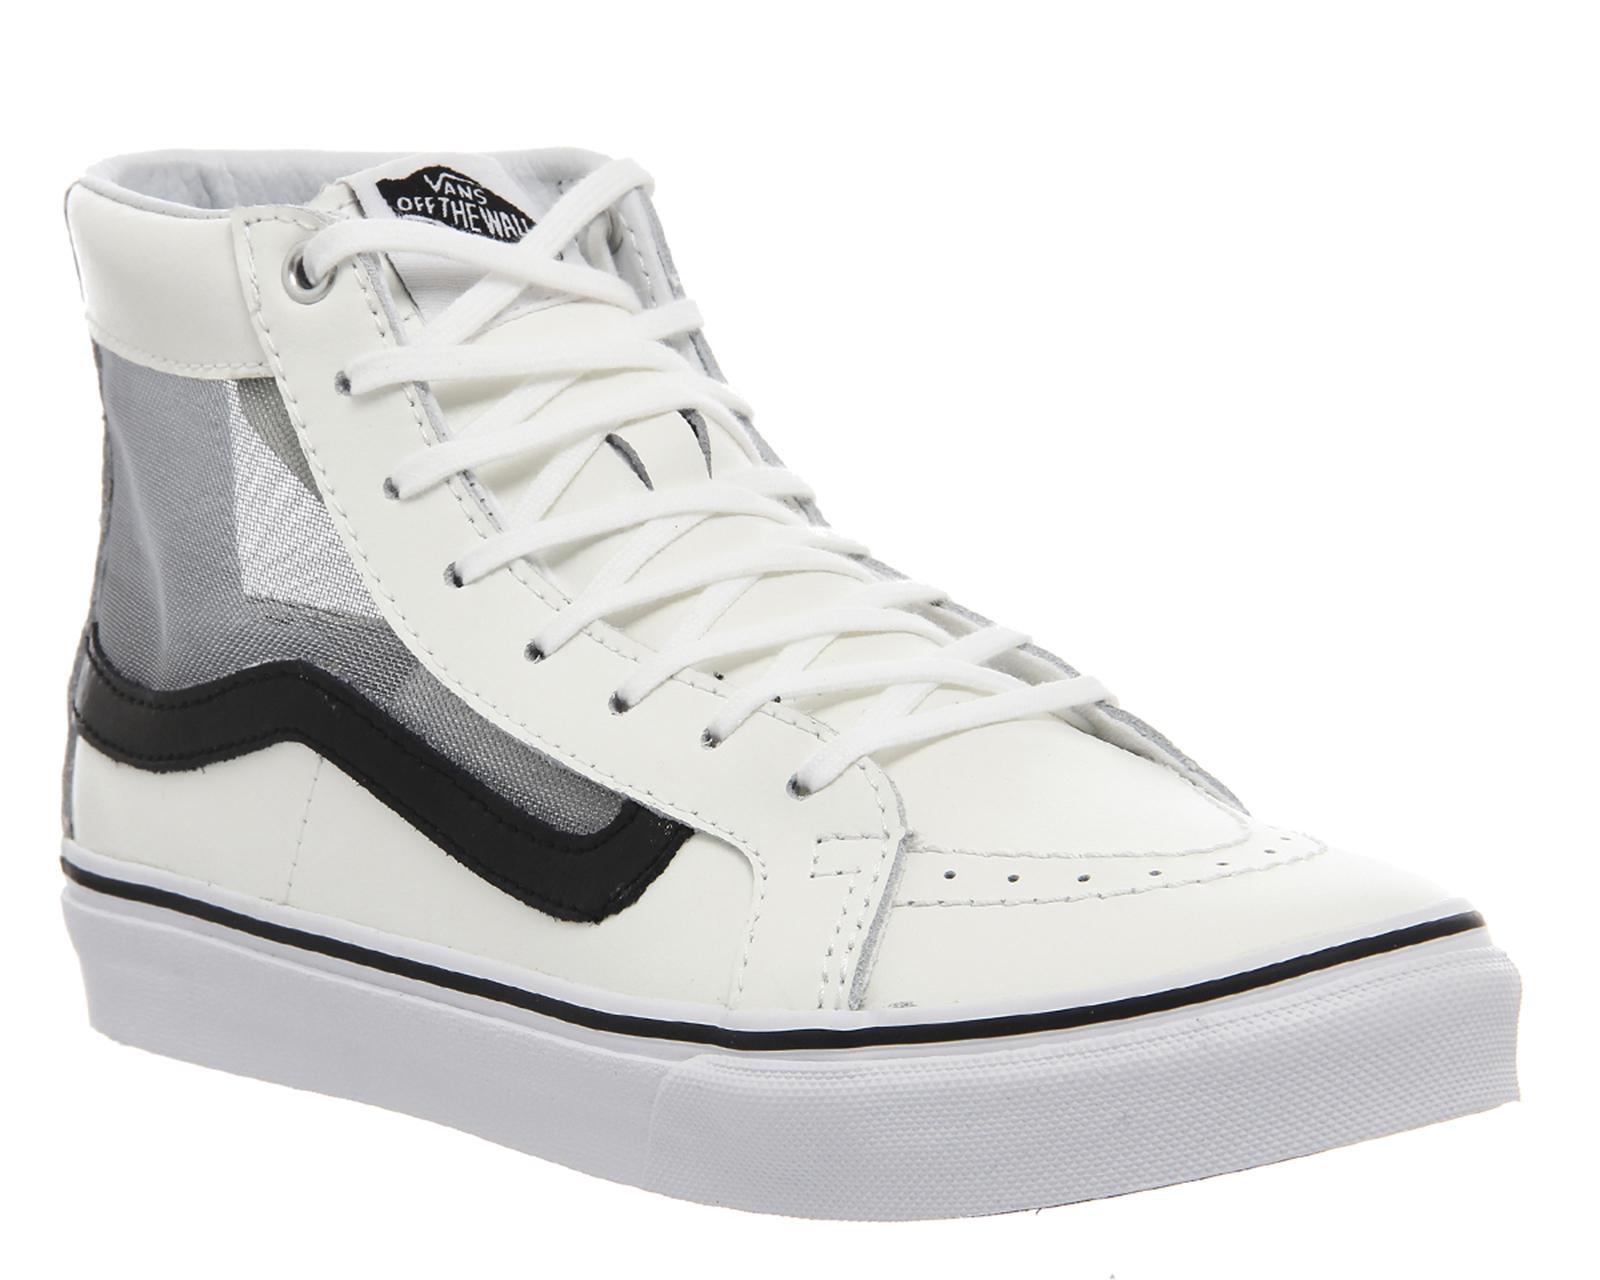 e8587d1a7ae94 Lyst - Vans Sk8 Hi Slim in White